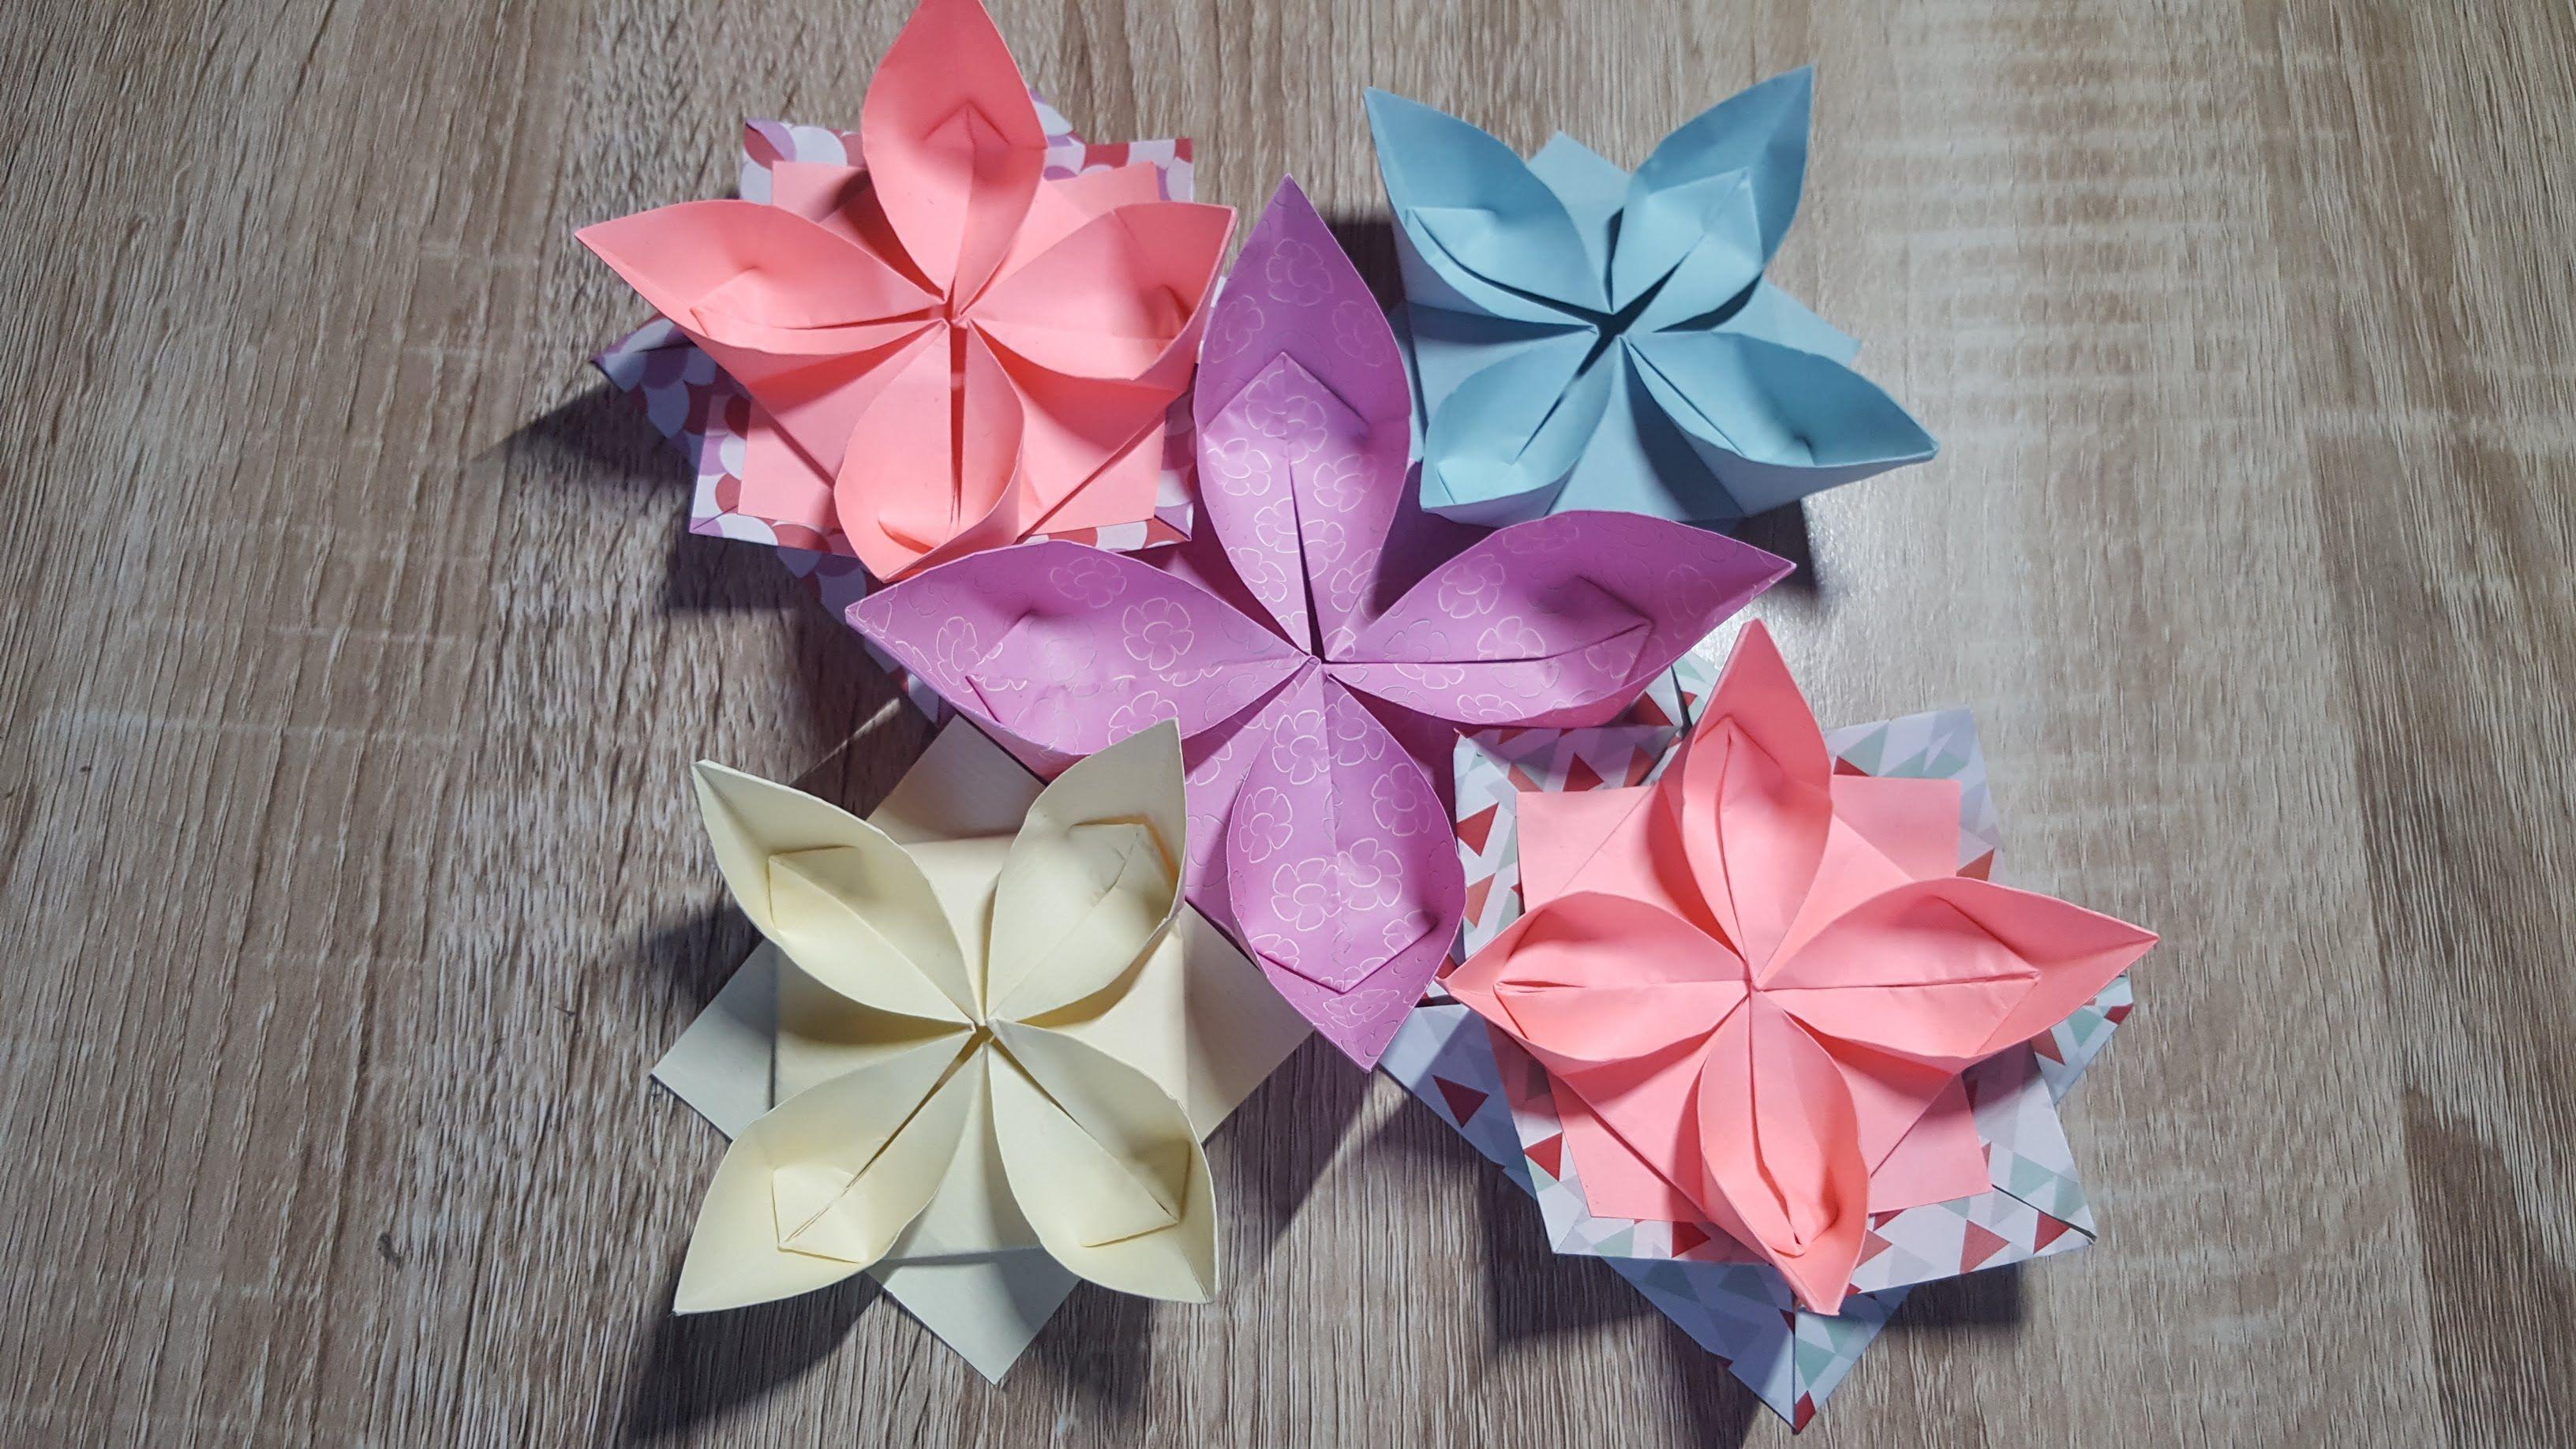 Einfache origami blume falten wasserliliehow to make an origami einfache origami blume falten wasserliliehow to make an origami water lily youtube jeuxipadfo Image collections